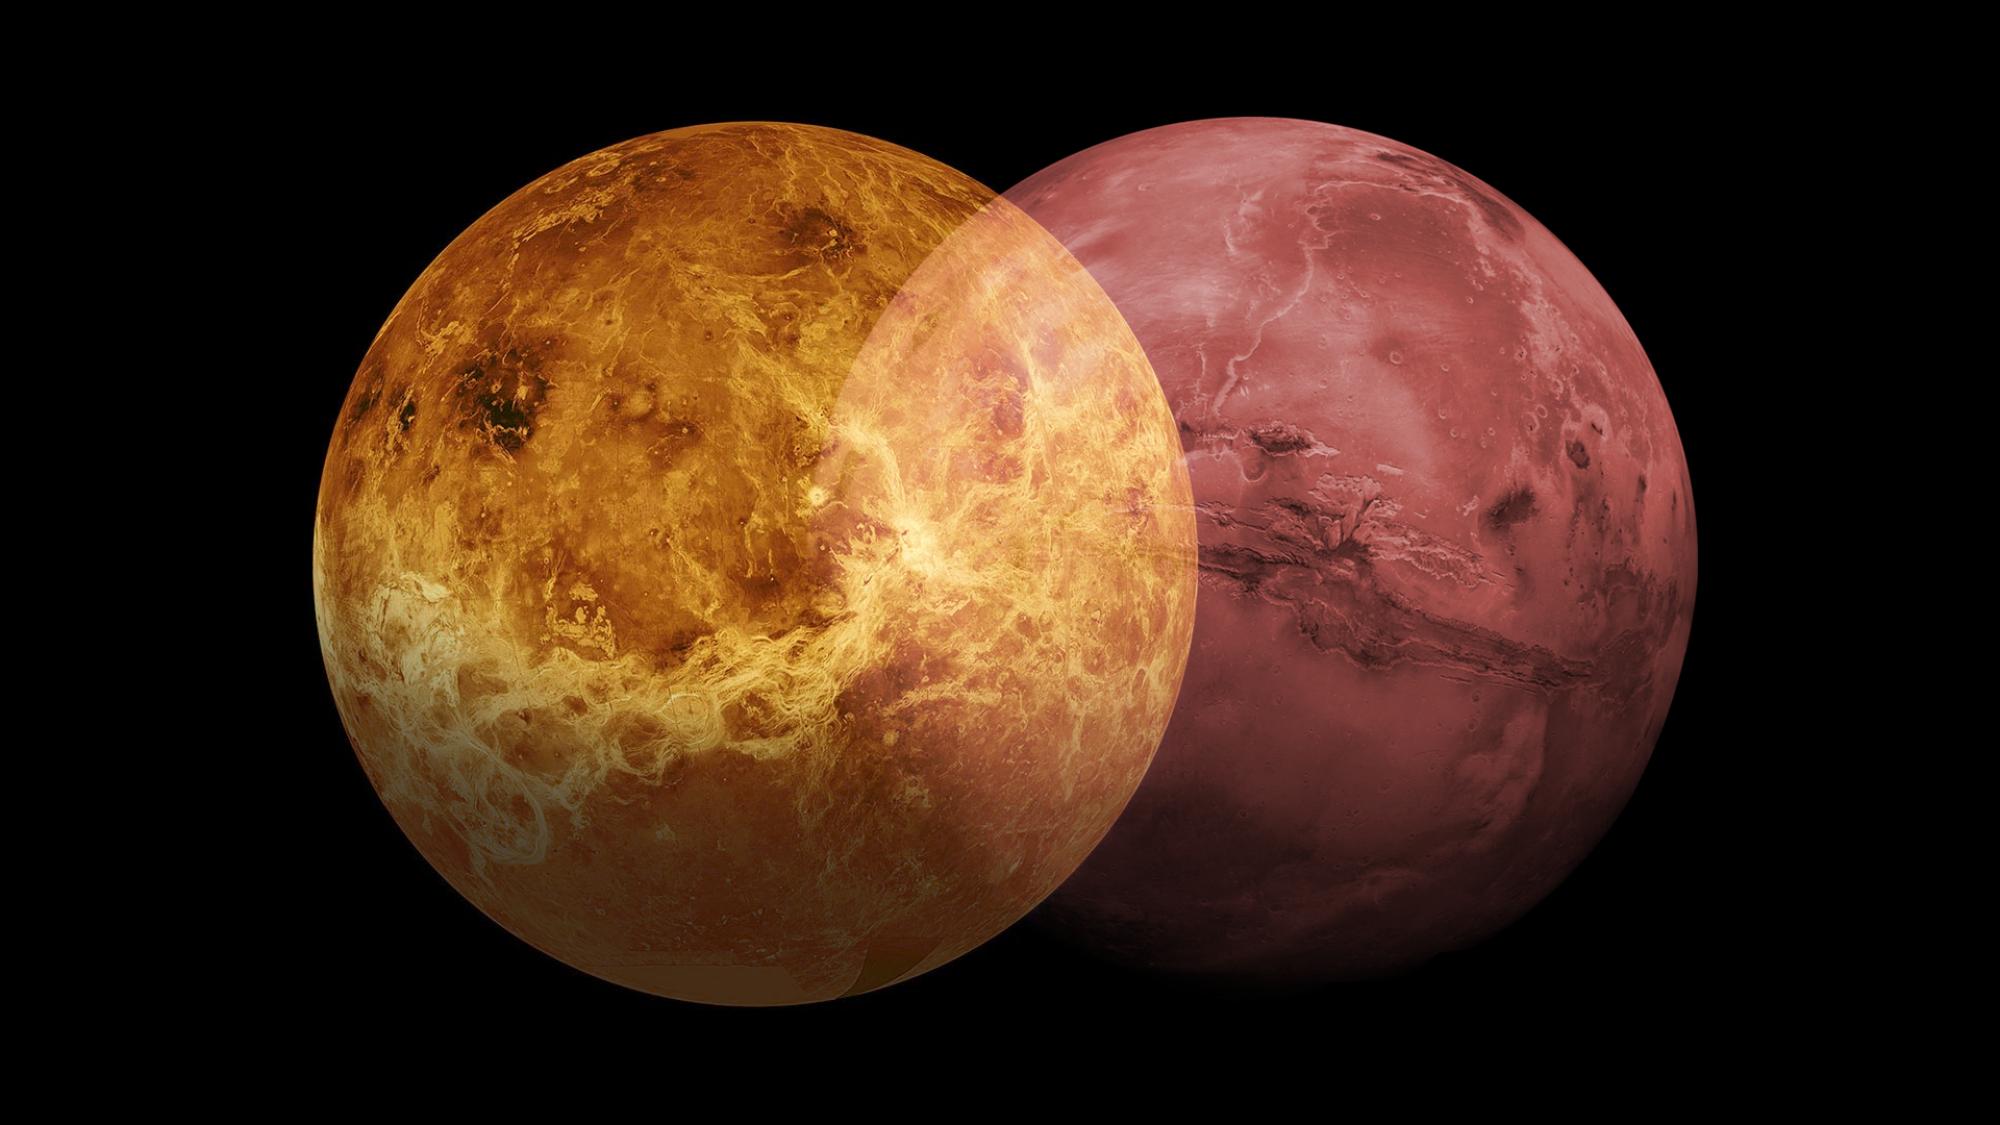 Venus and Mars as a ven diagram